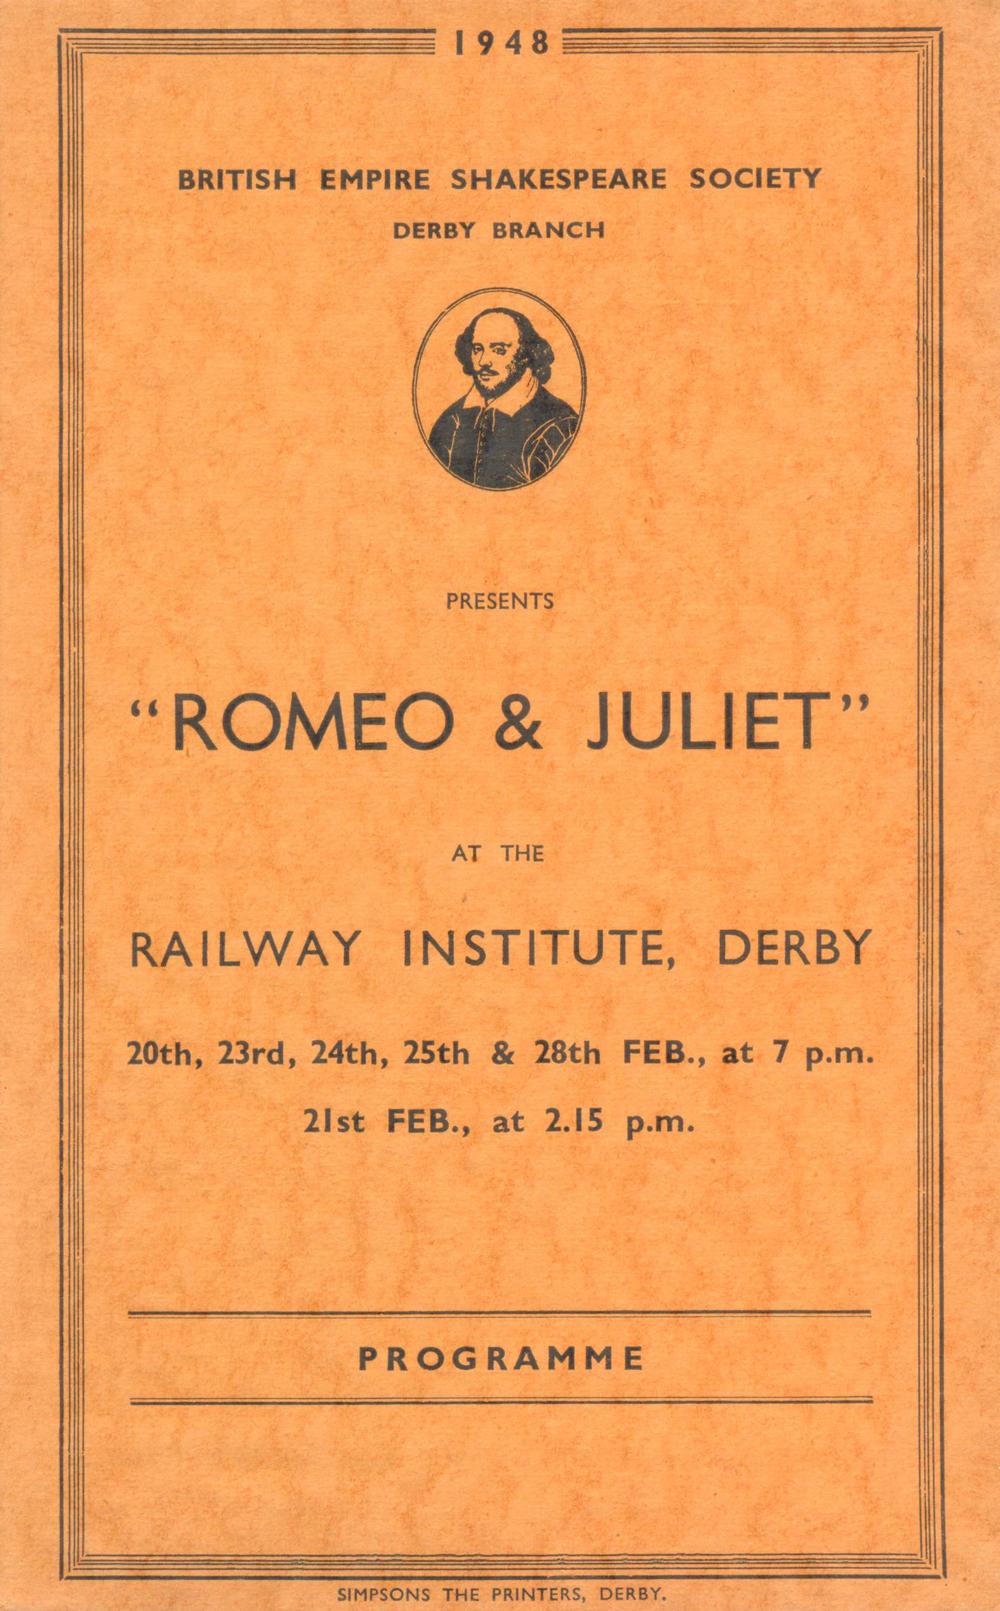 'Romeo & Juliet' 1948